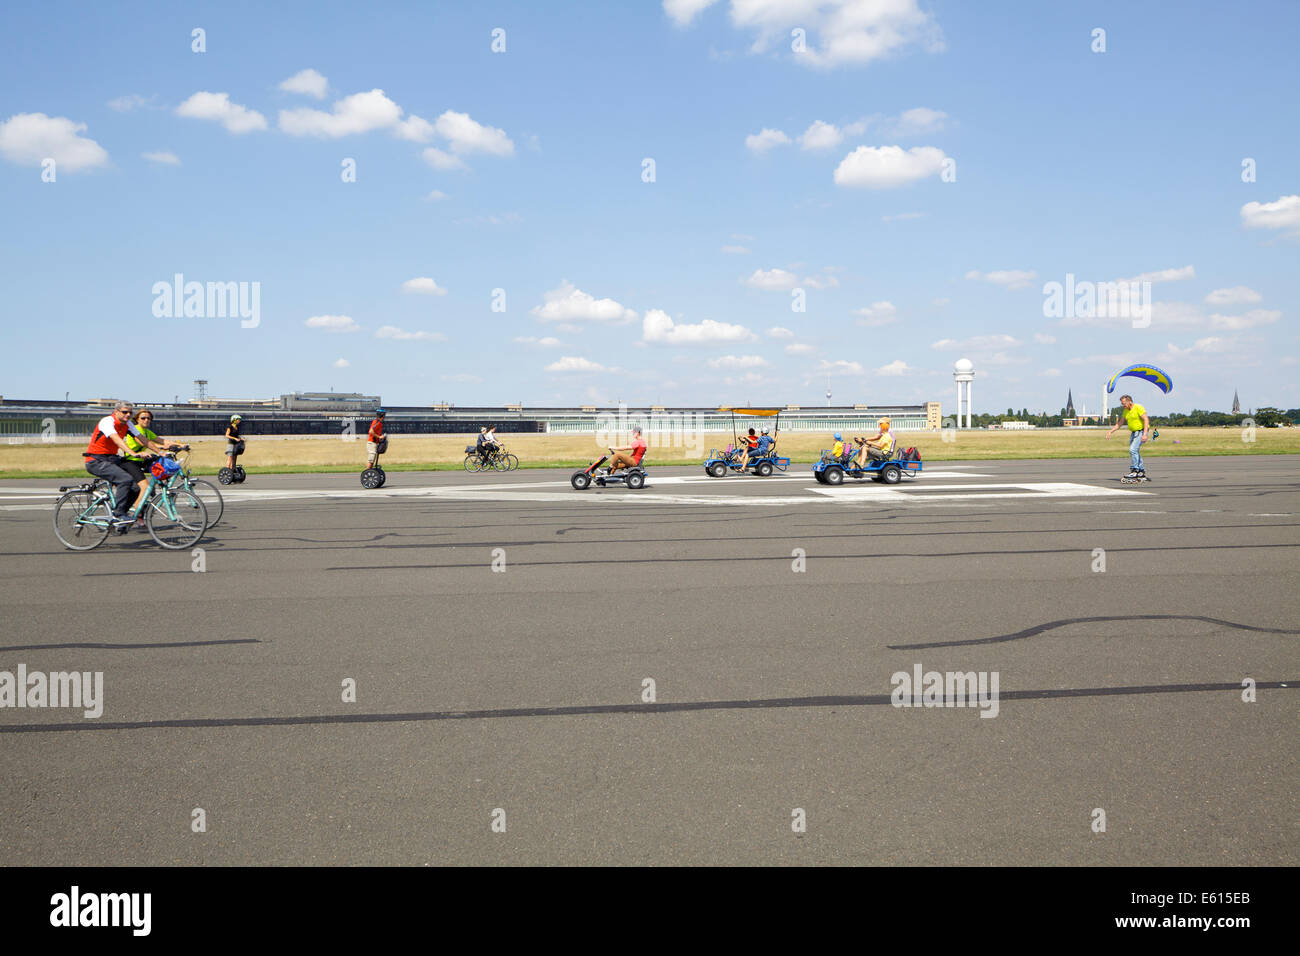 Les gens qui font de divers sports au parc de Tempelhof, l'ancien aéroport de Tempelhof, Berlin, Allemagne Banque D'Images